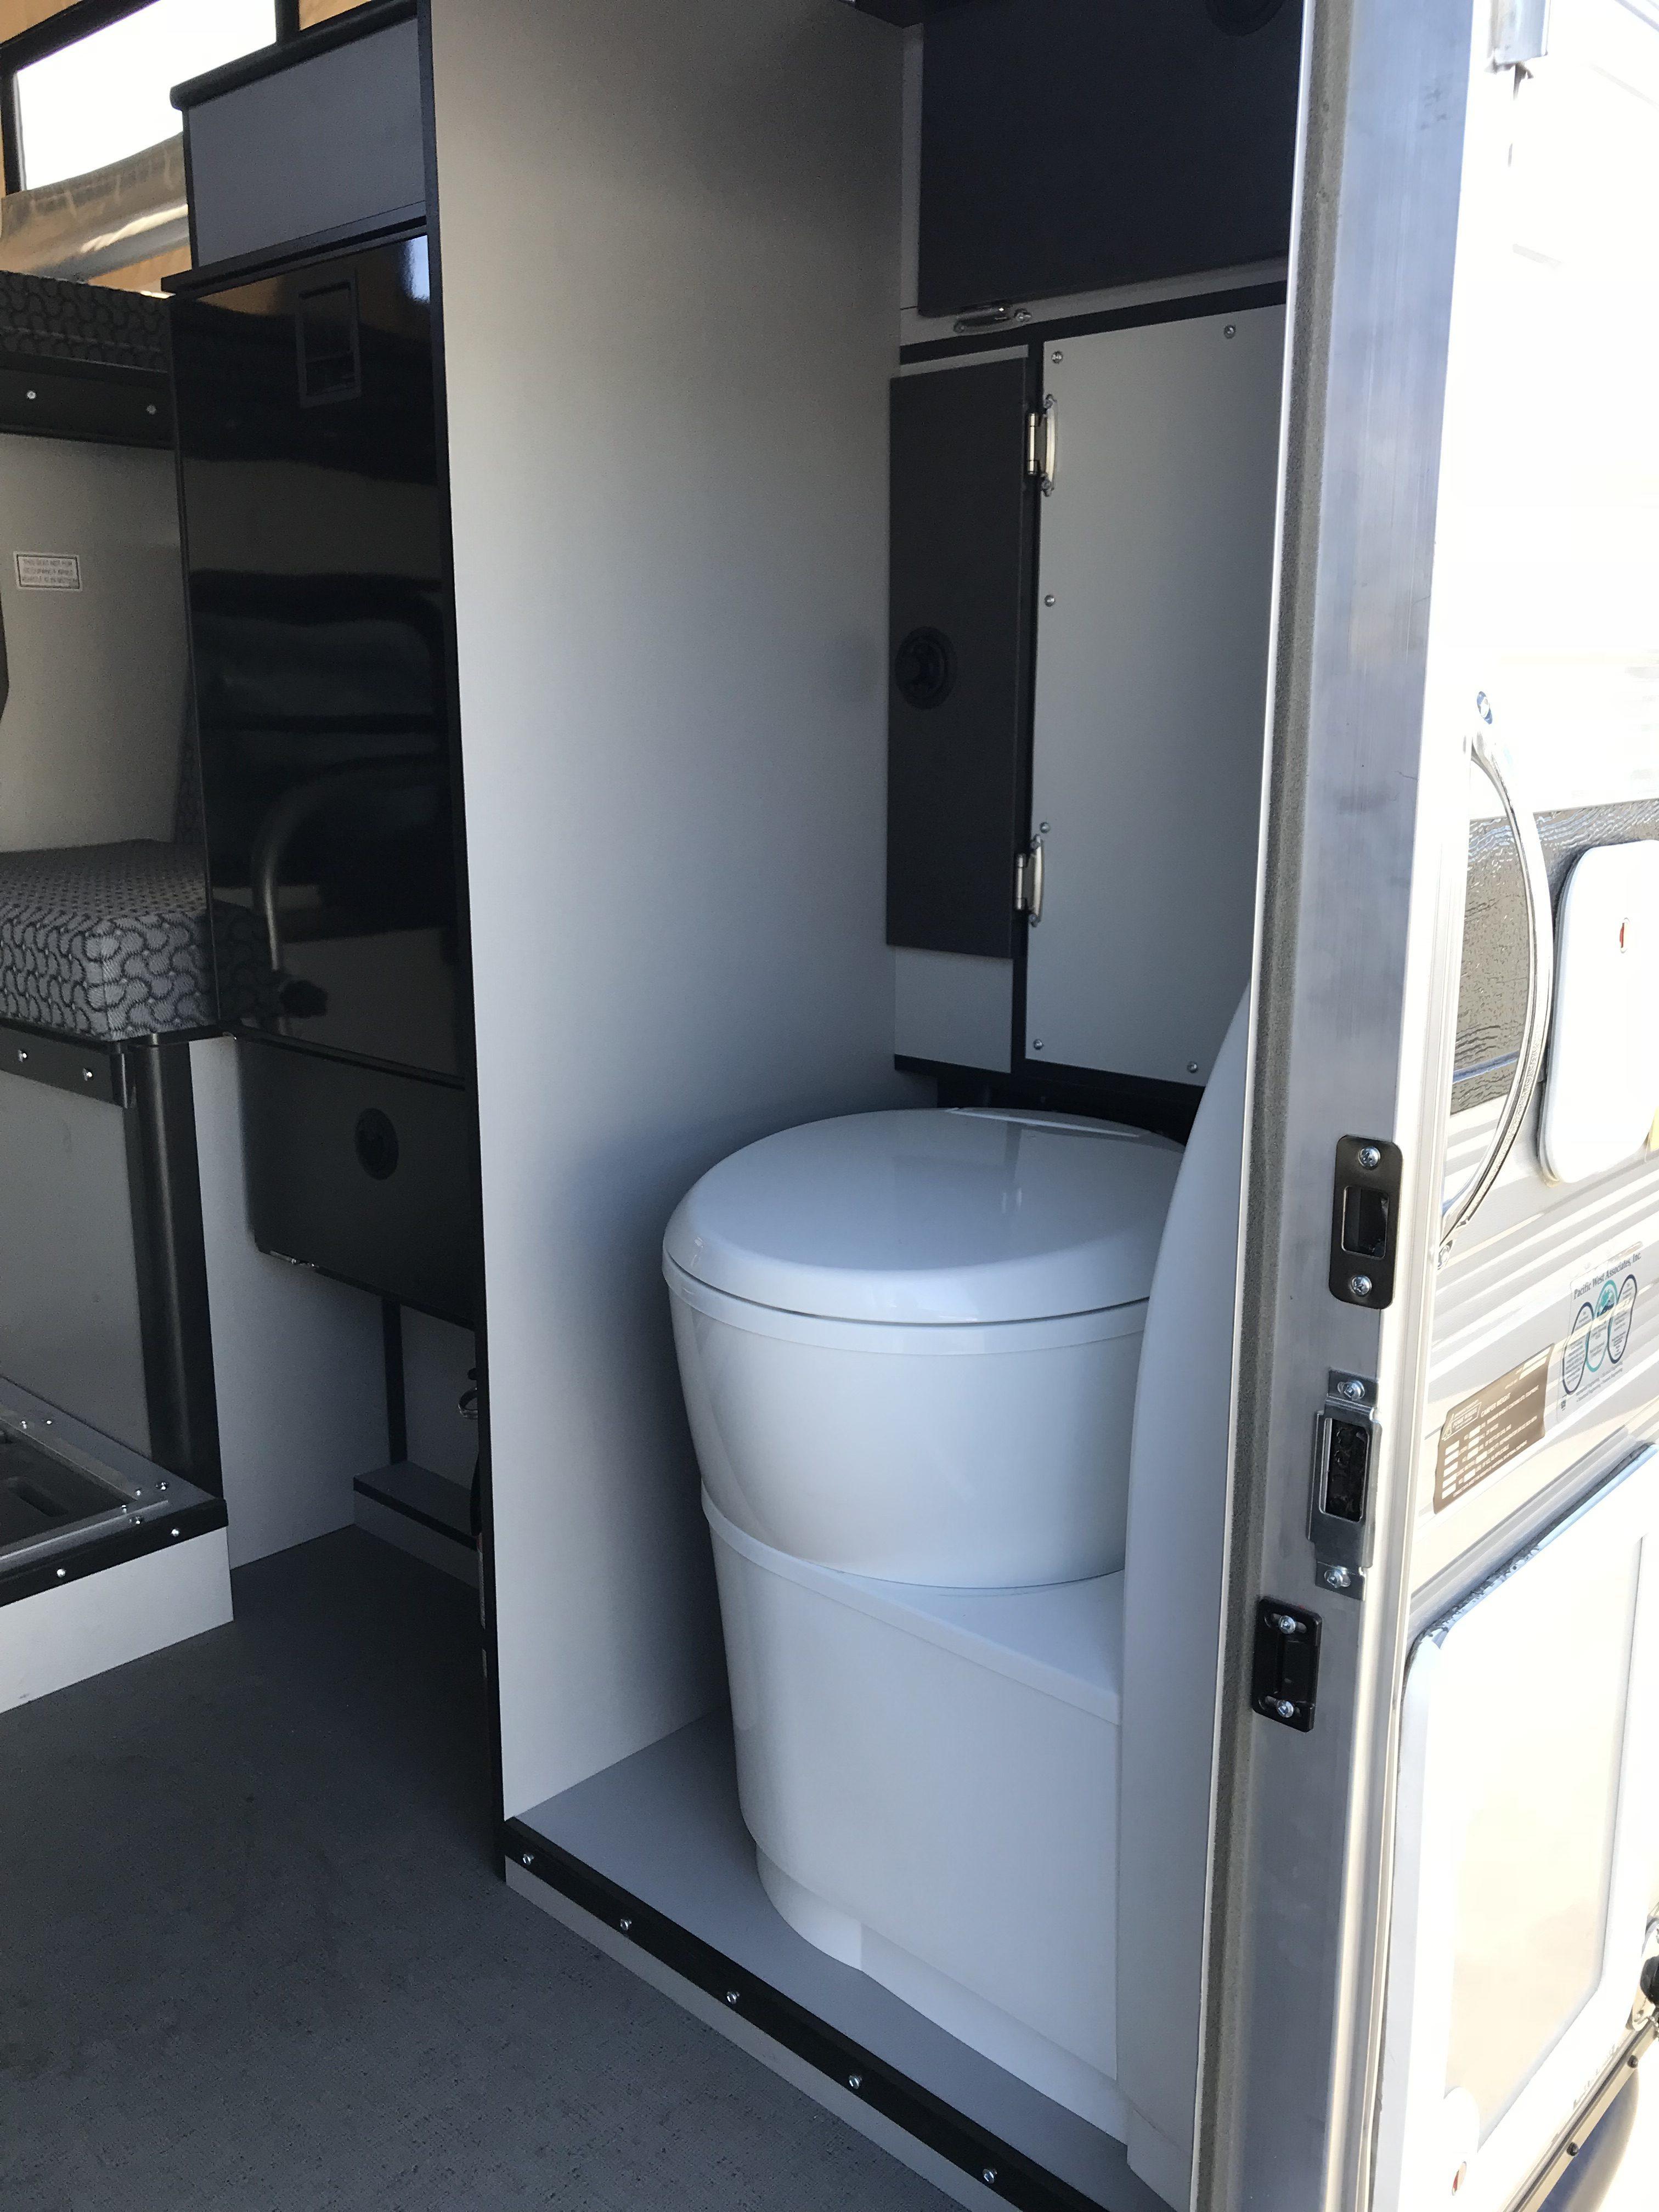 Four Wheel Campers - Toilet built in